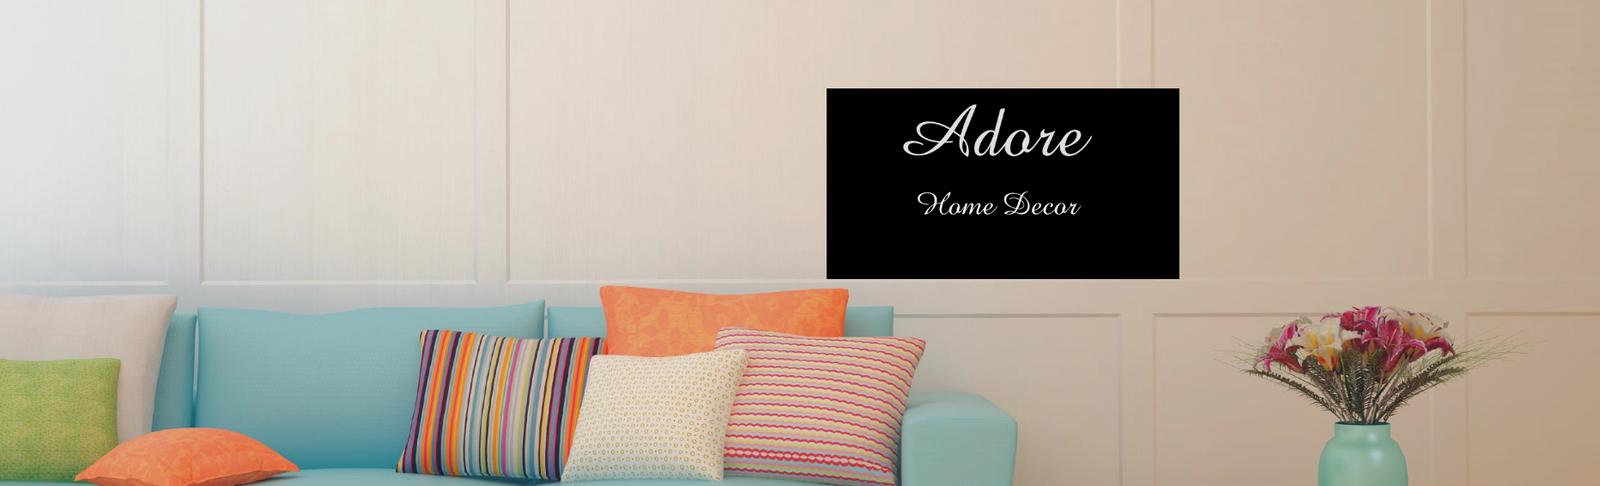 Items In Adore Home Decor Store On EBay